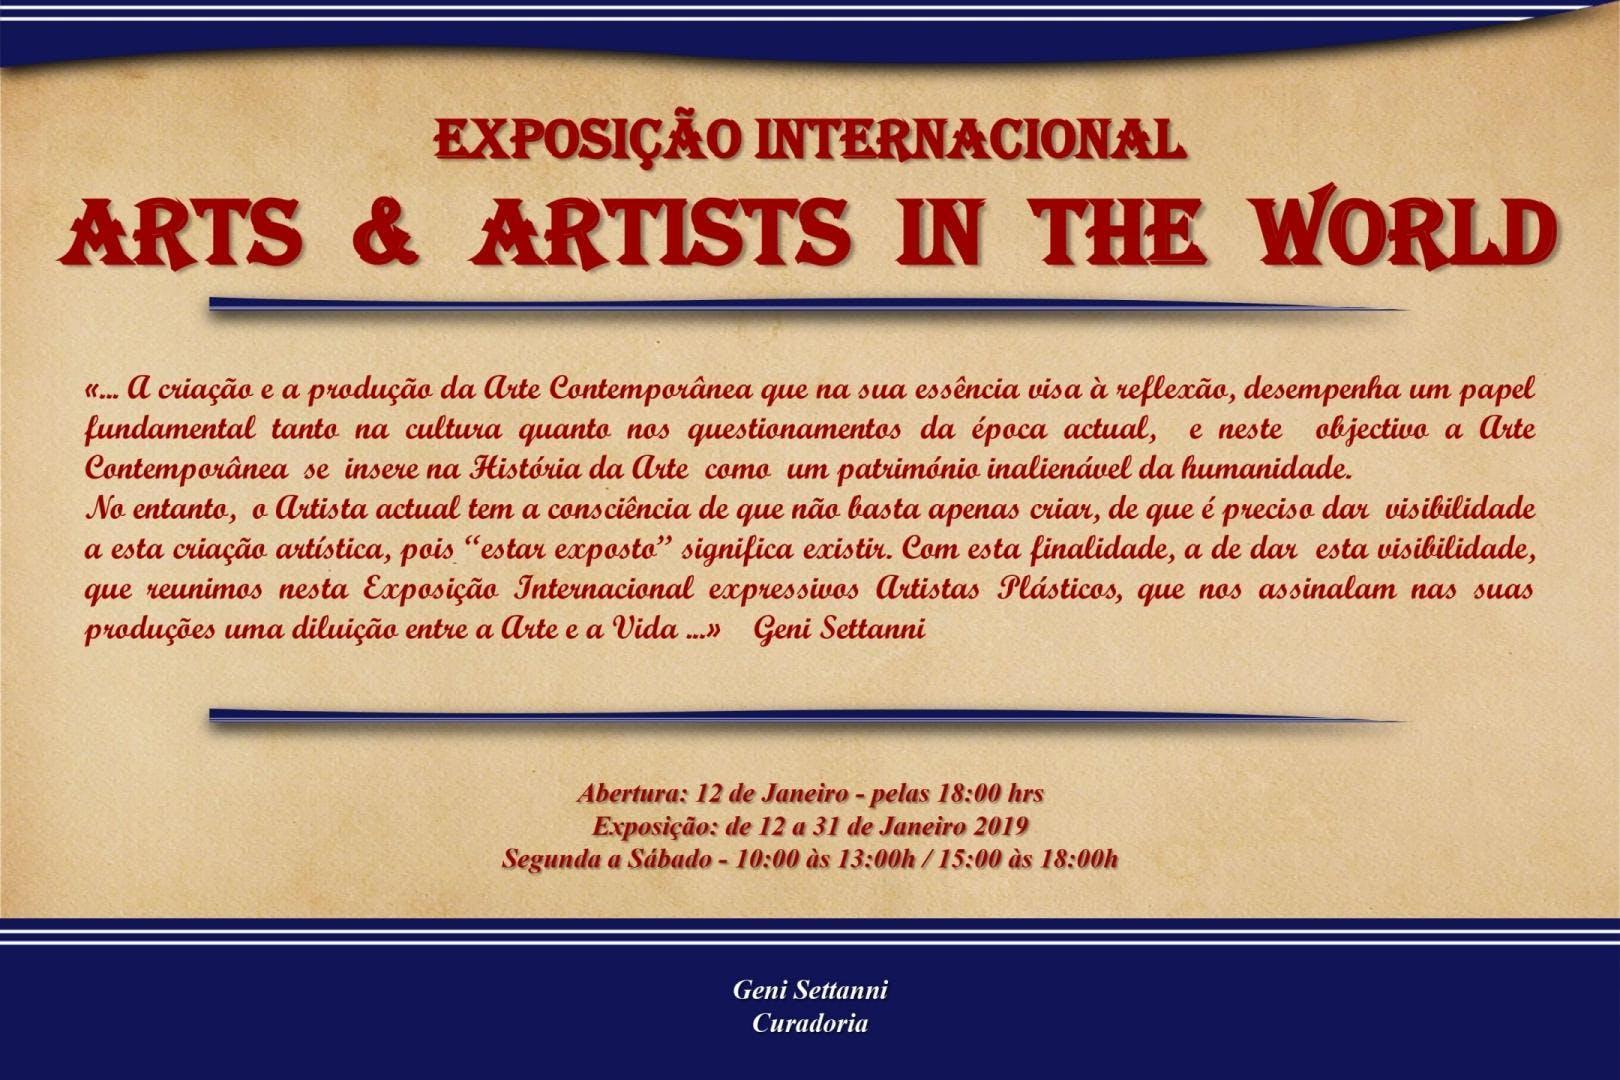 Exposição Internacional ARTS & ARTISTS IN THE WORLD - Portugal